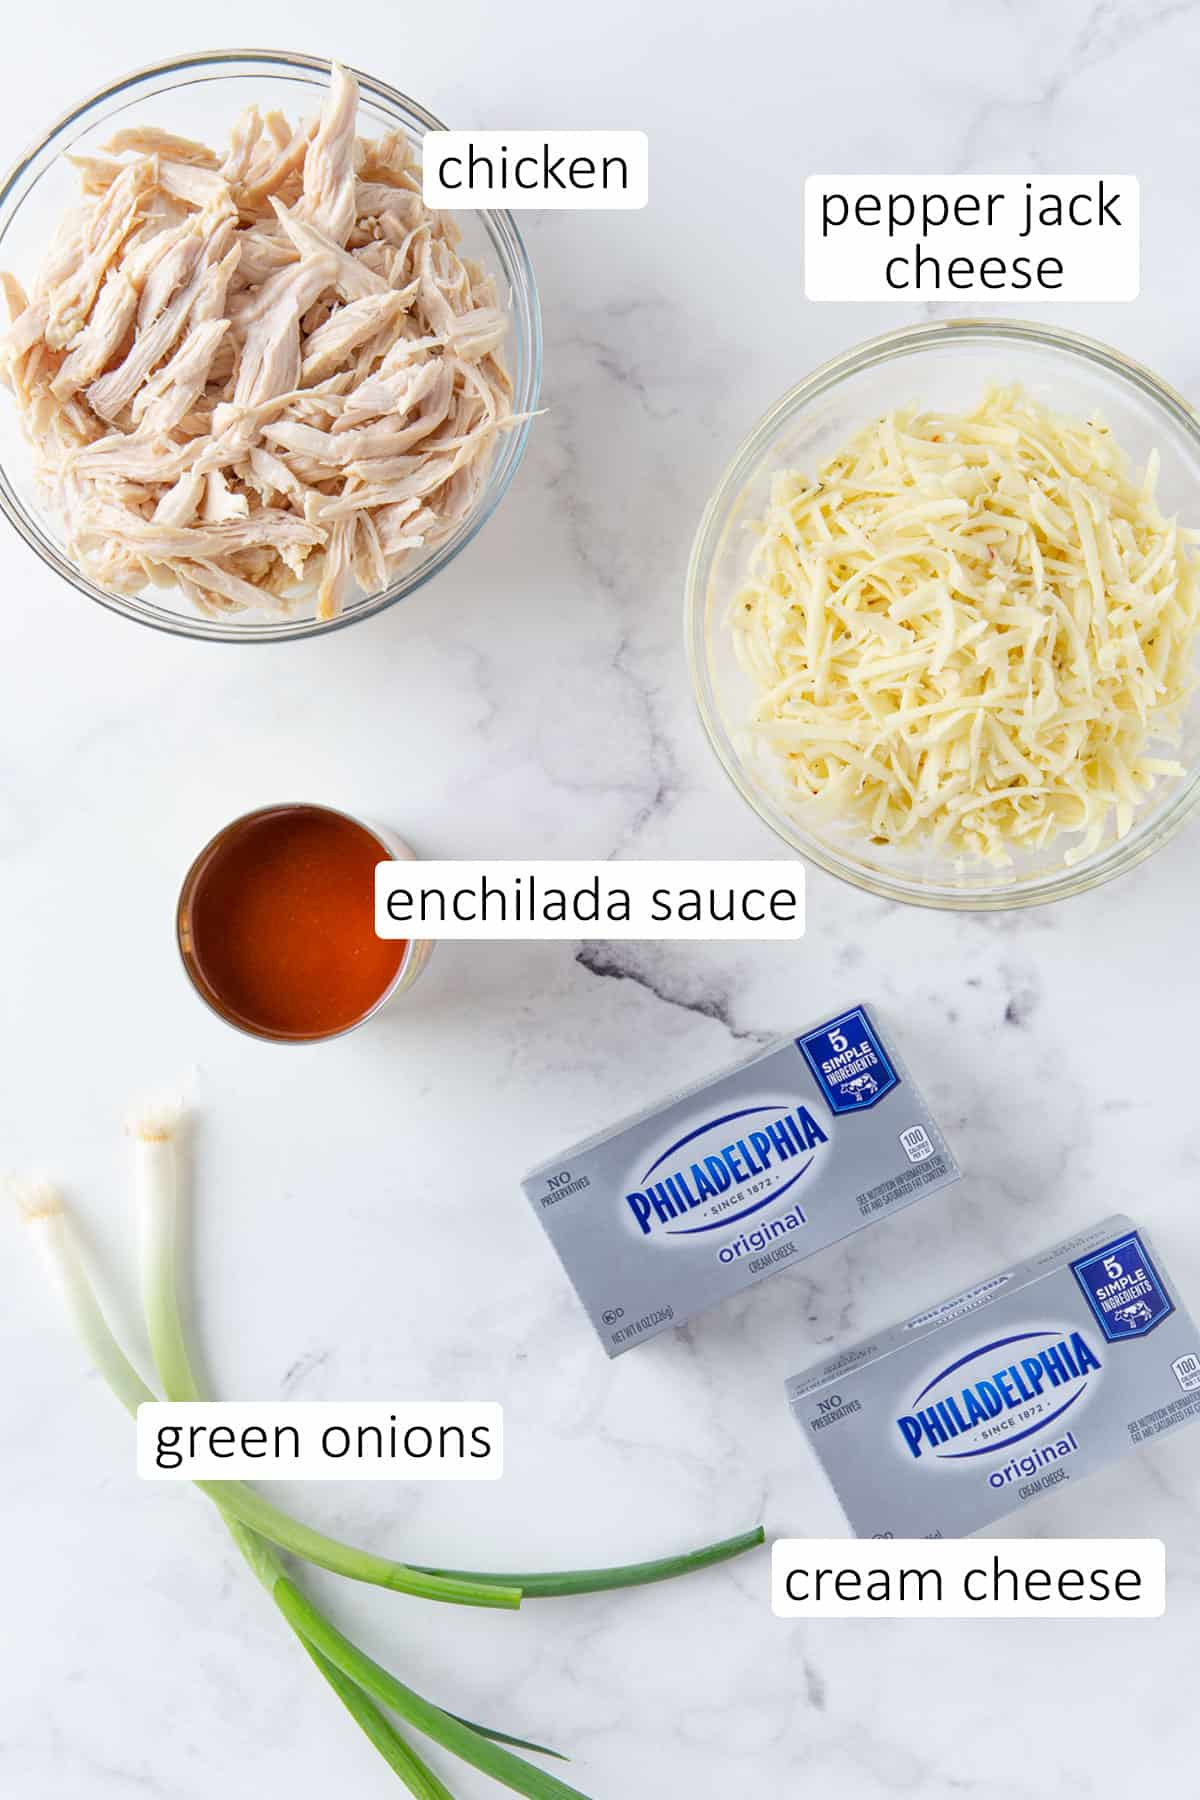 Overhead view of ingredients for crock pot chicken enchilada dip.